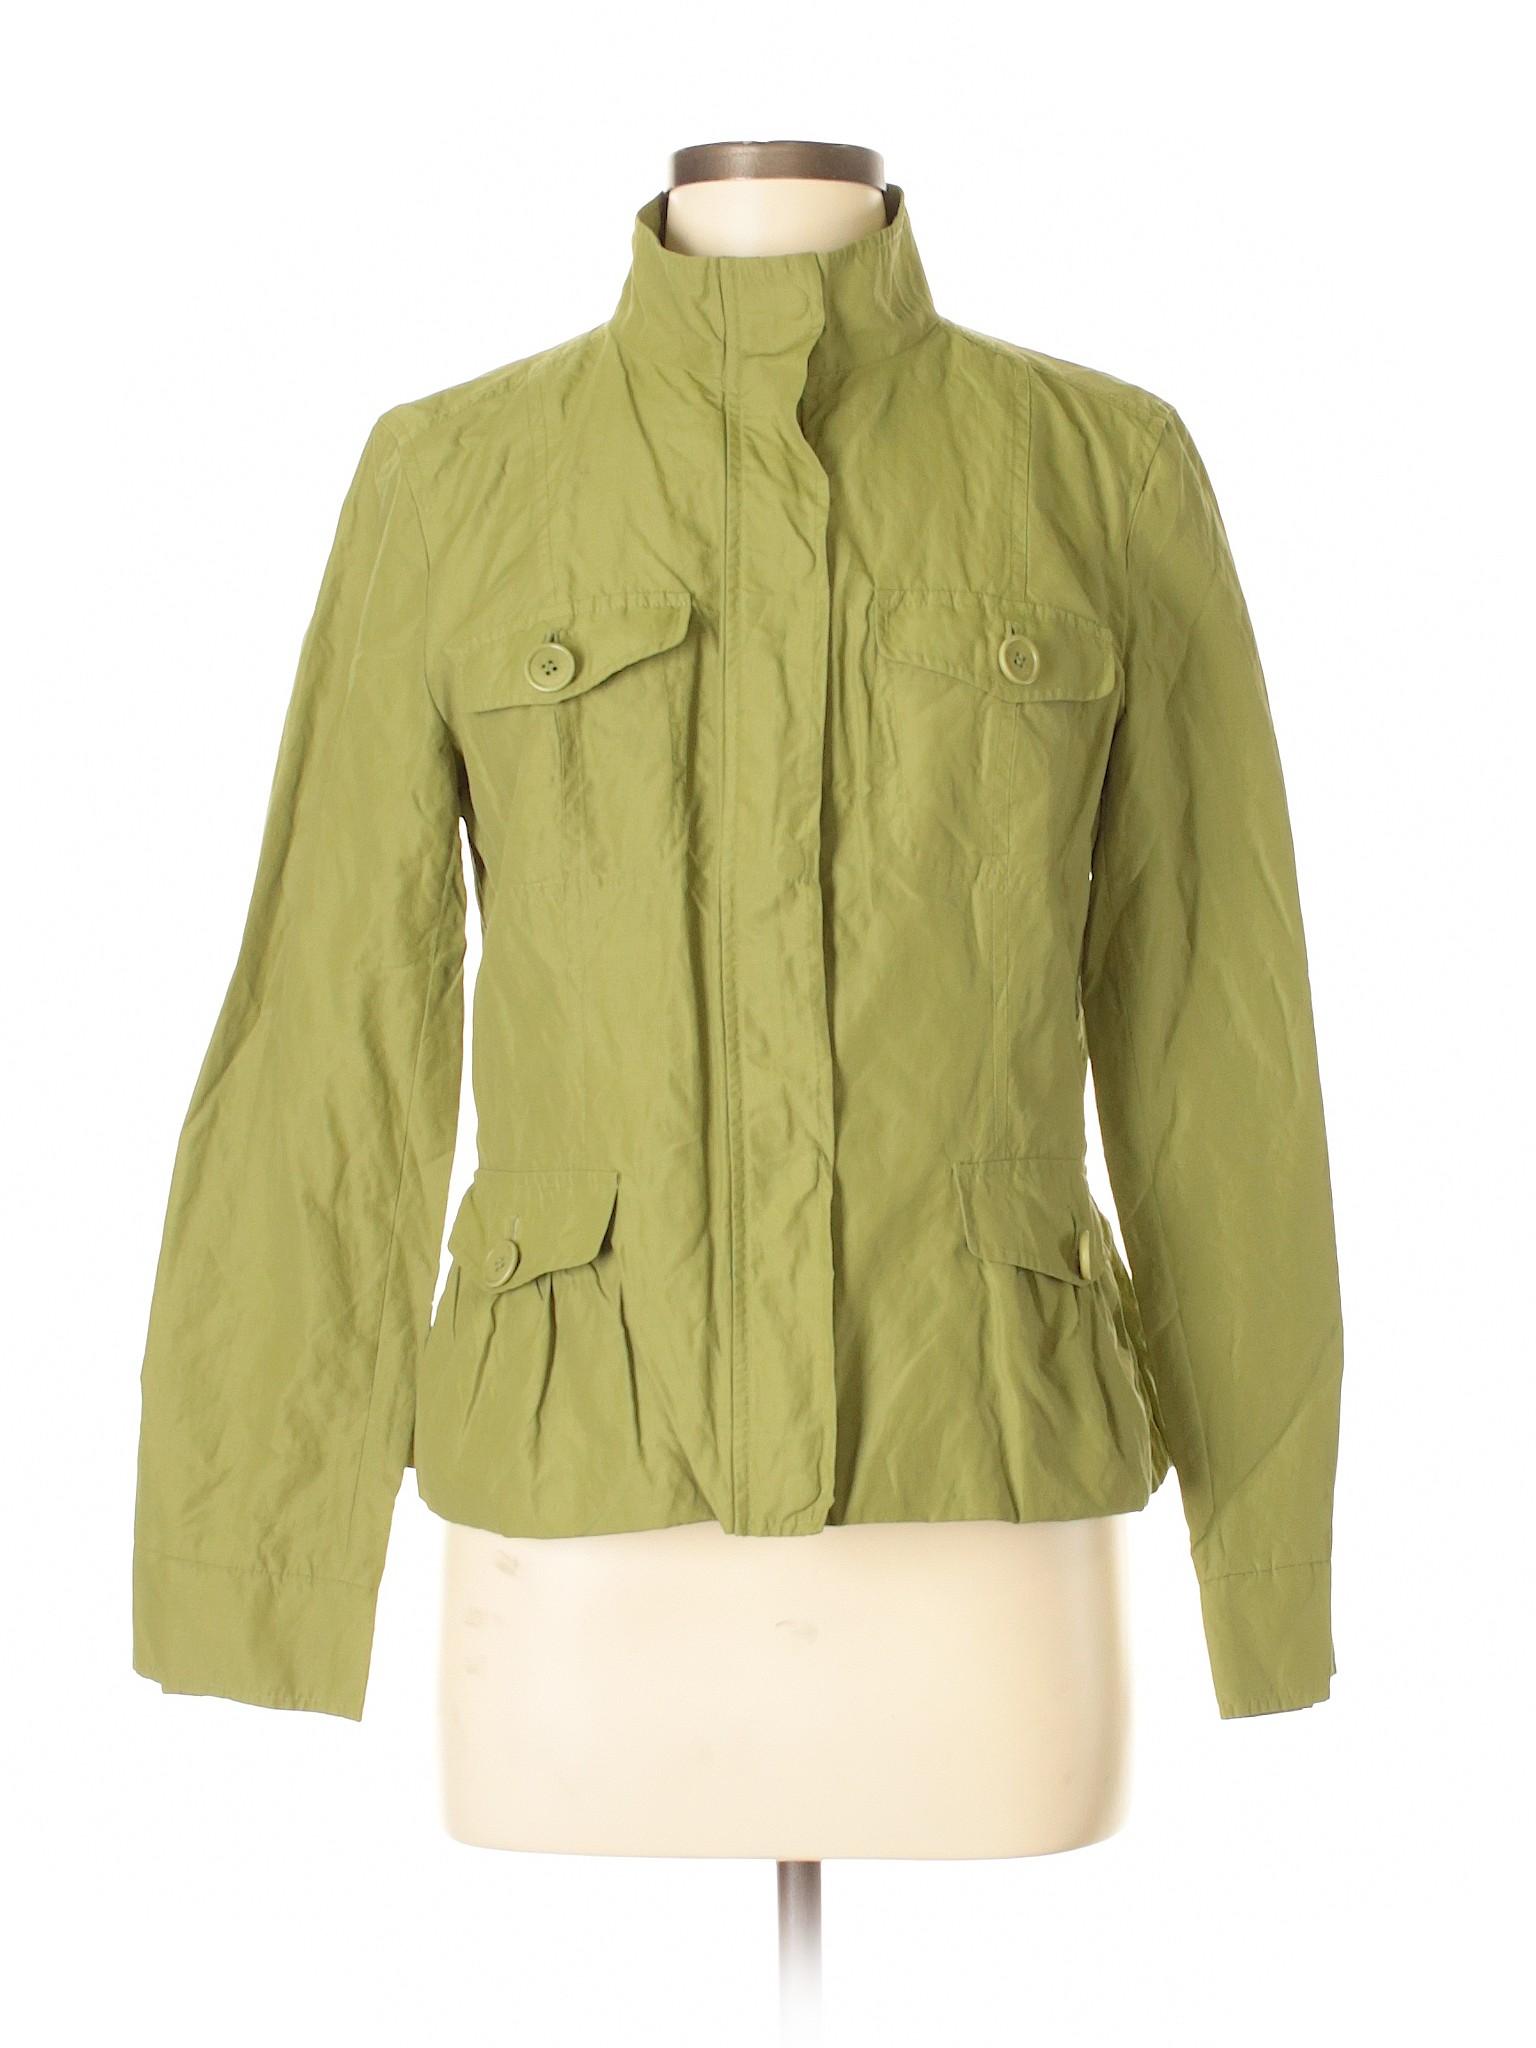 Boutique Boutique Jacket winter winter Talbots 6rwq61Y